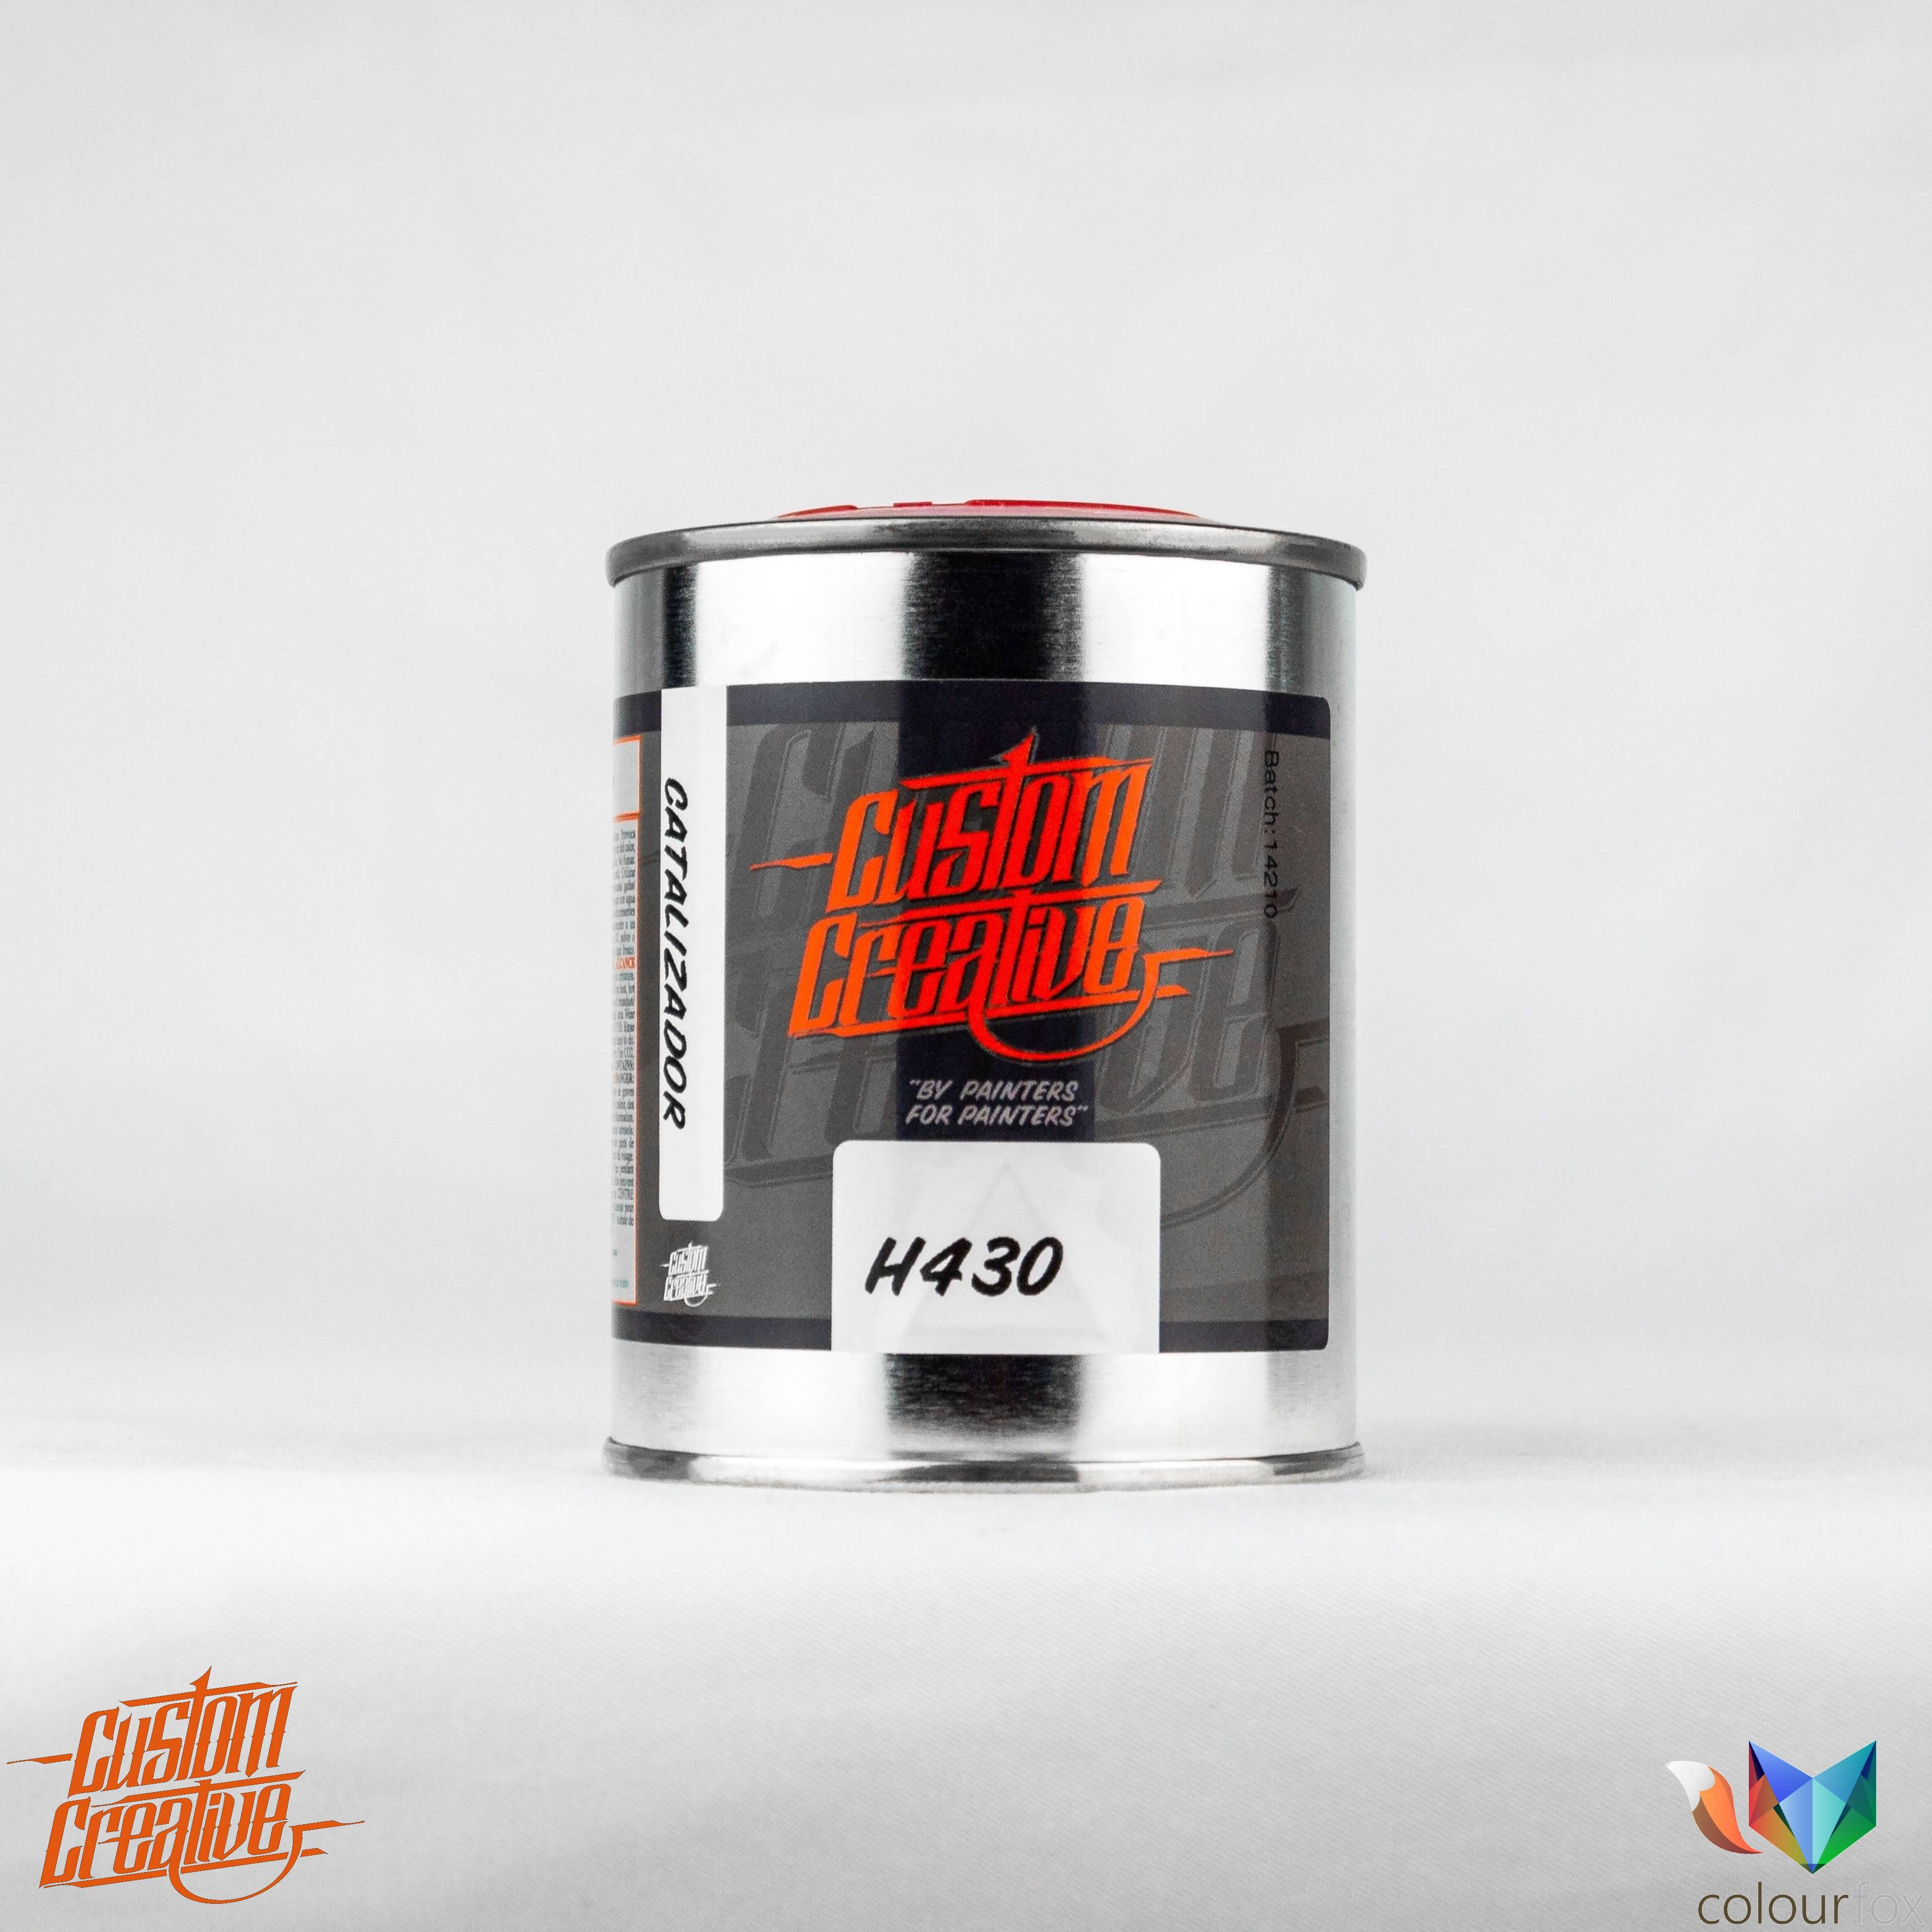 Catalizador H430 para aparejo metalizado de Custom Creative Metallic Sealer en Colourfox